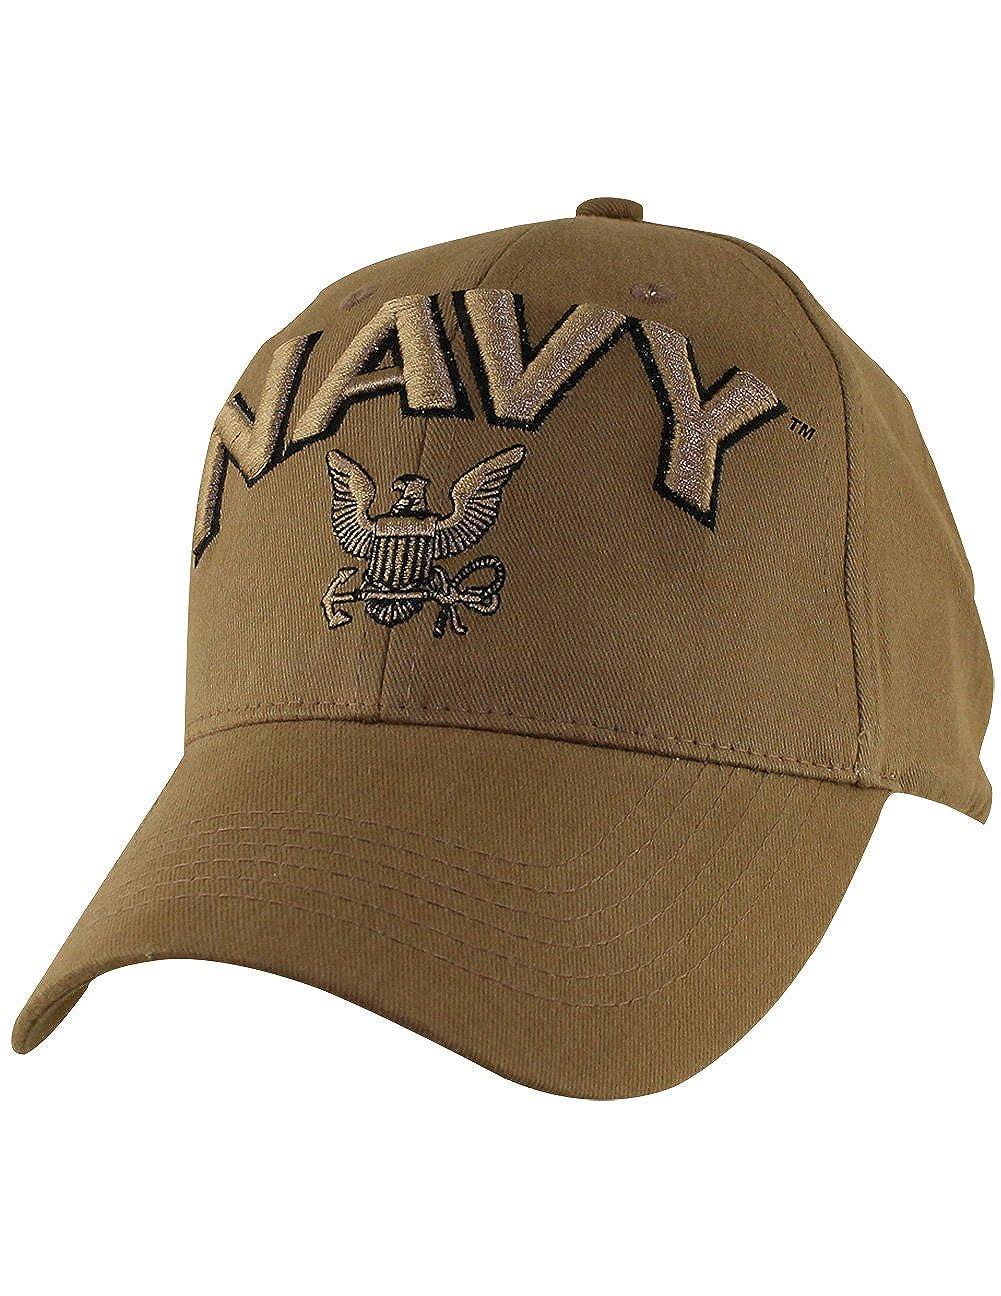 7db927bd939 Amazon.com  U.S. NAVY Insignia Hat - USN Coyote Brown Baseball Cap ...